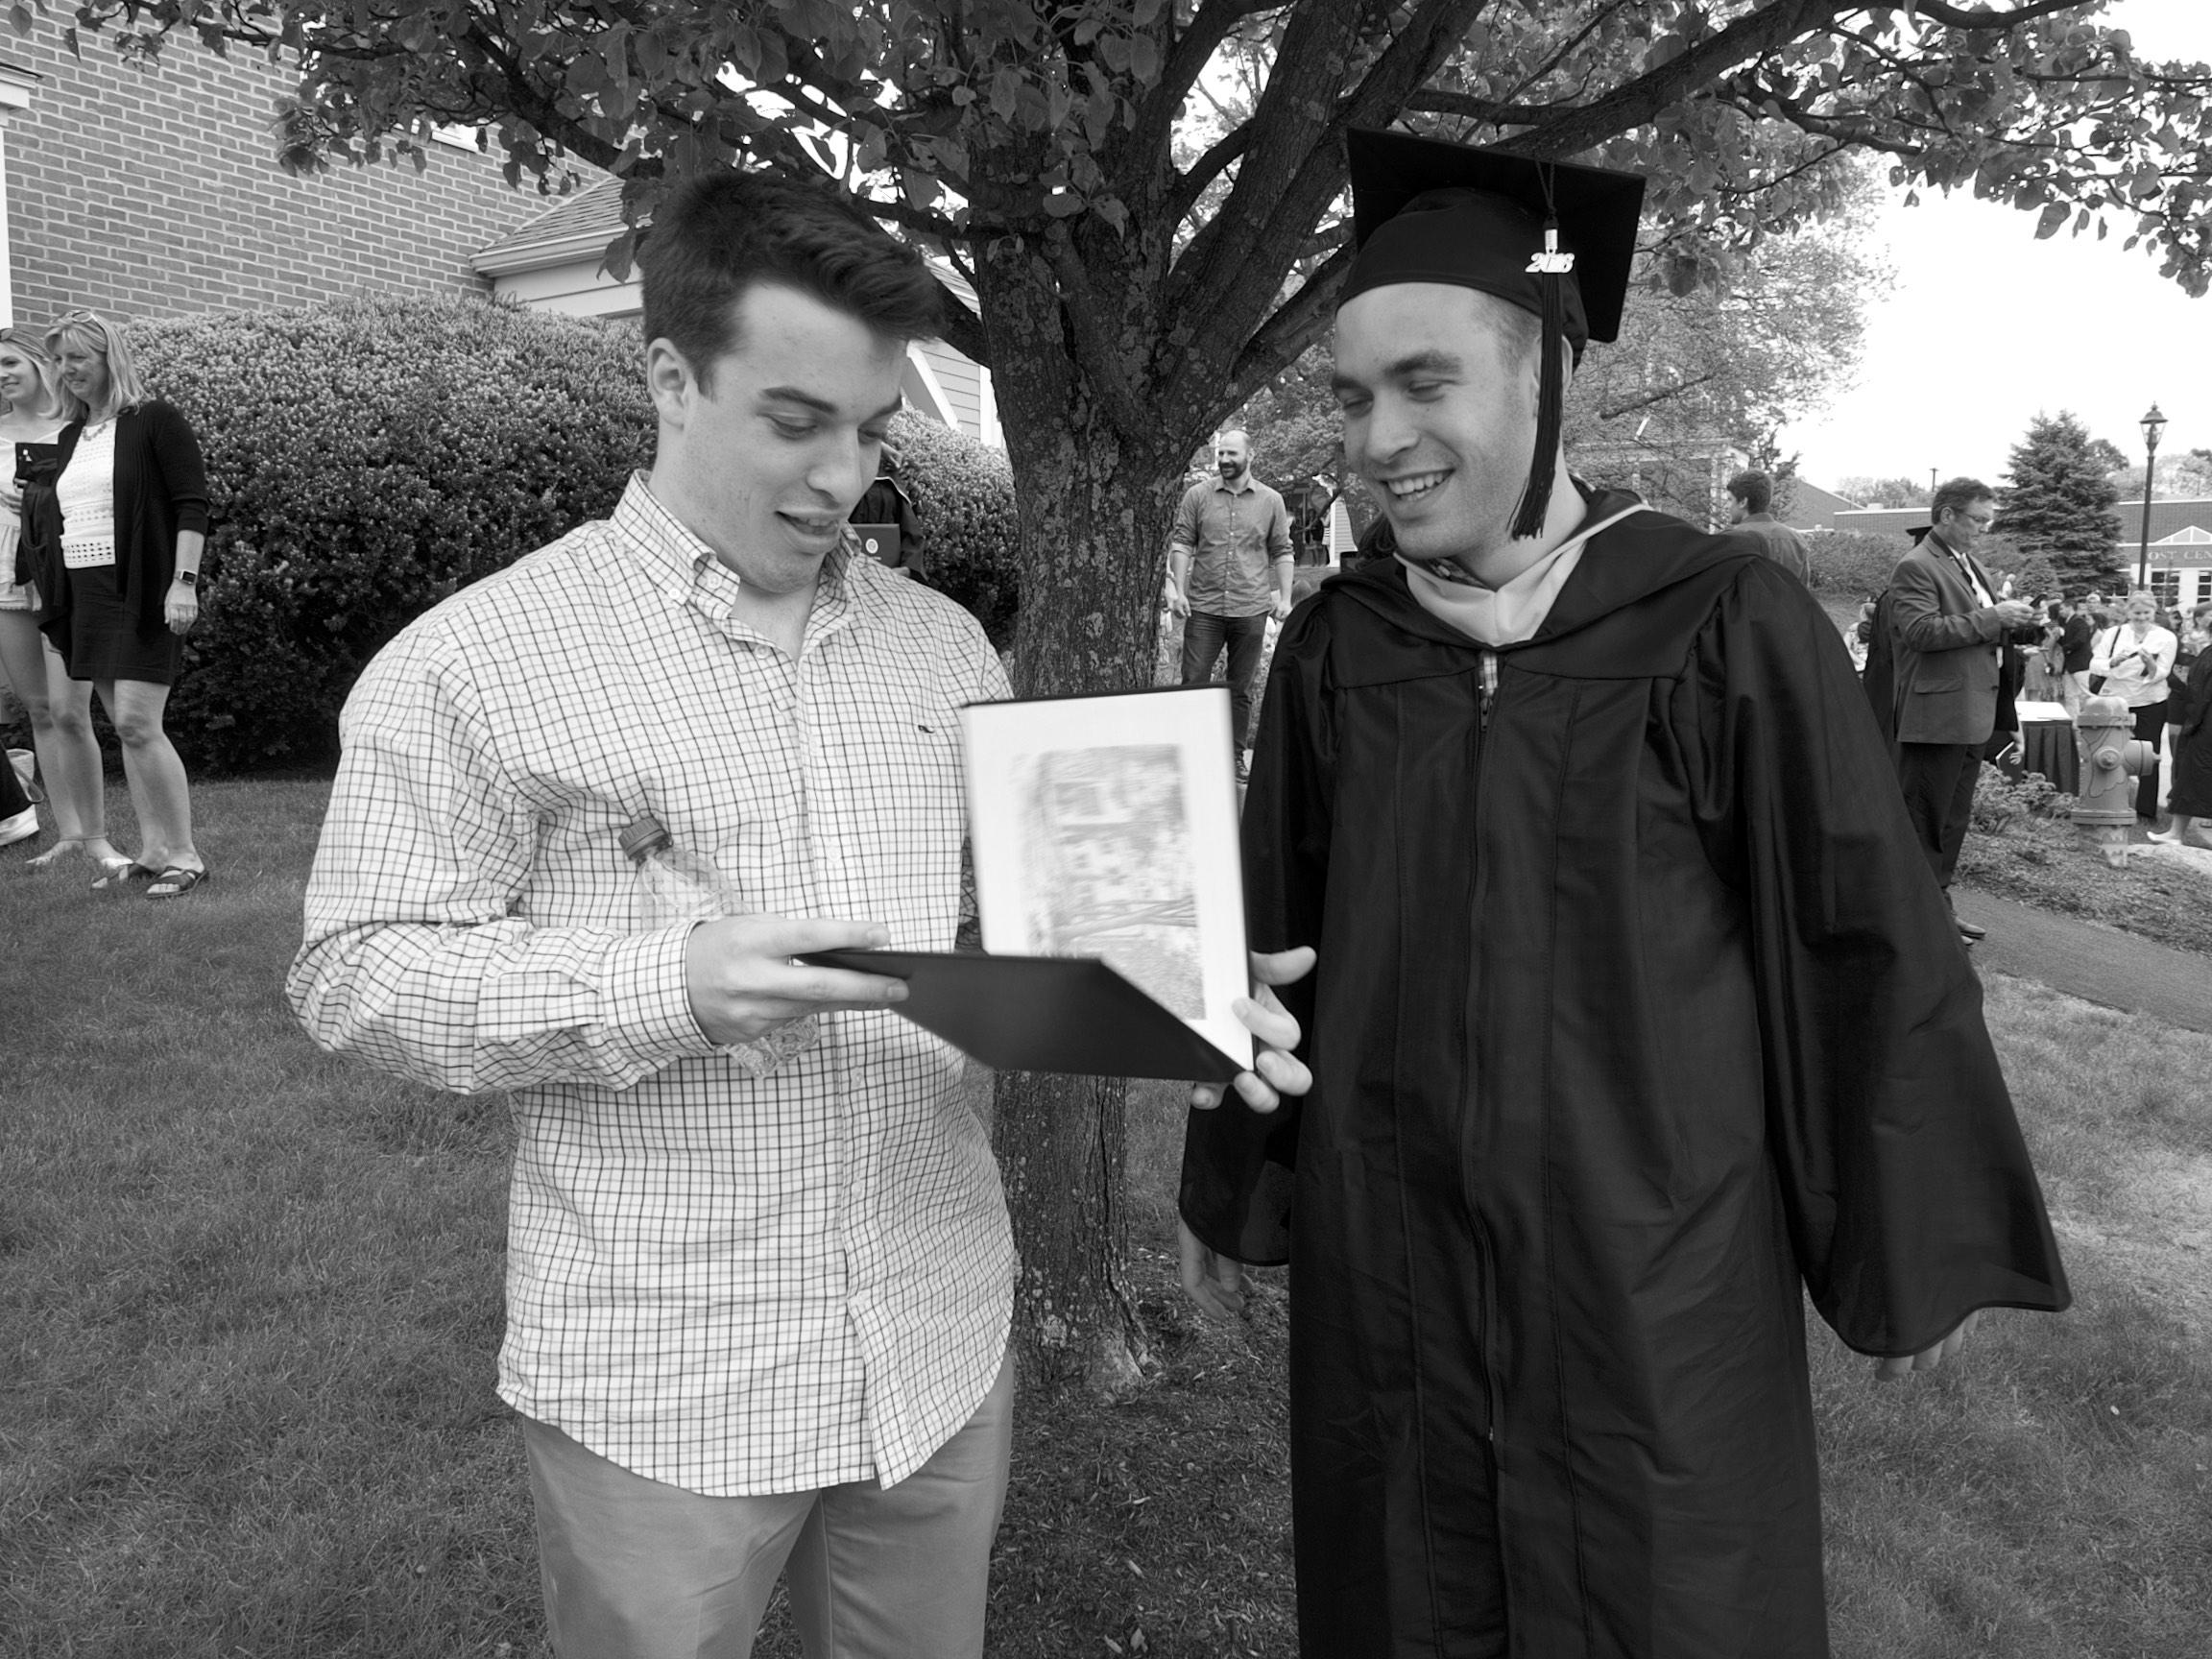 zach_graduation_P5210132.jpg